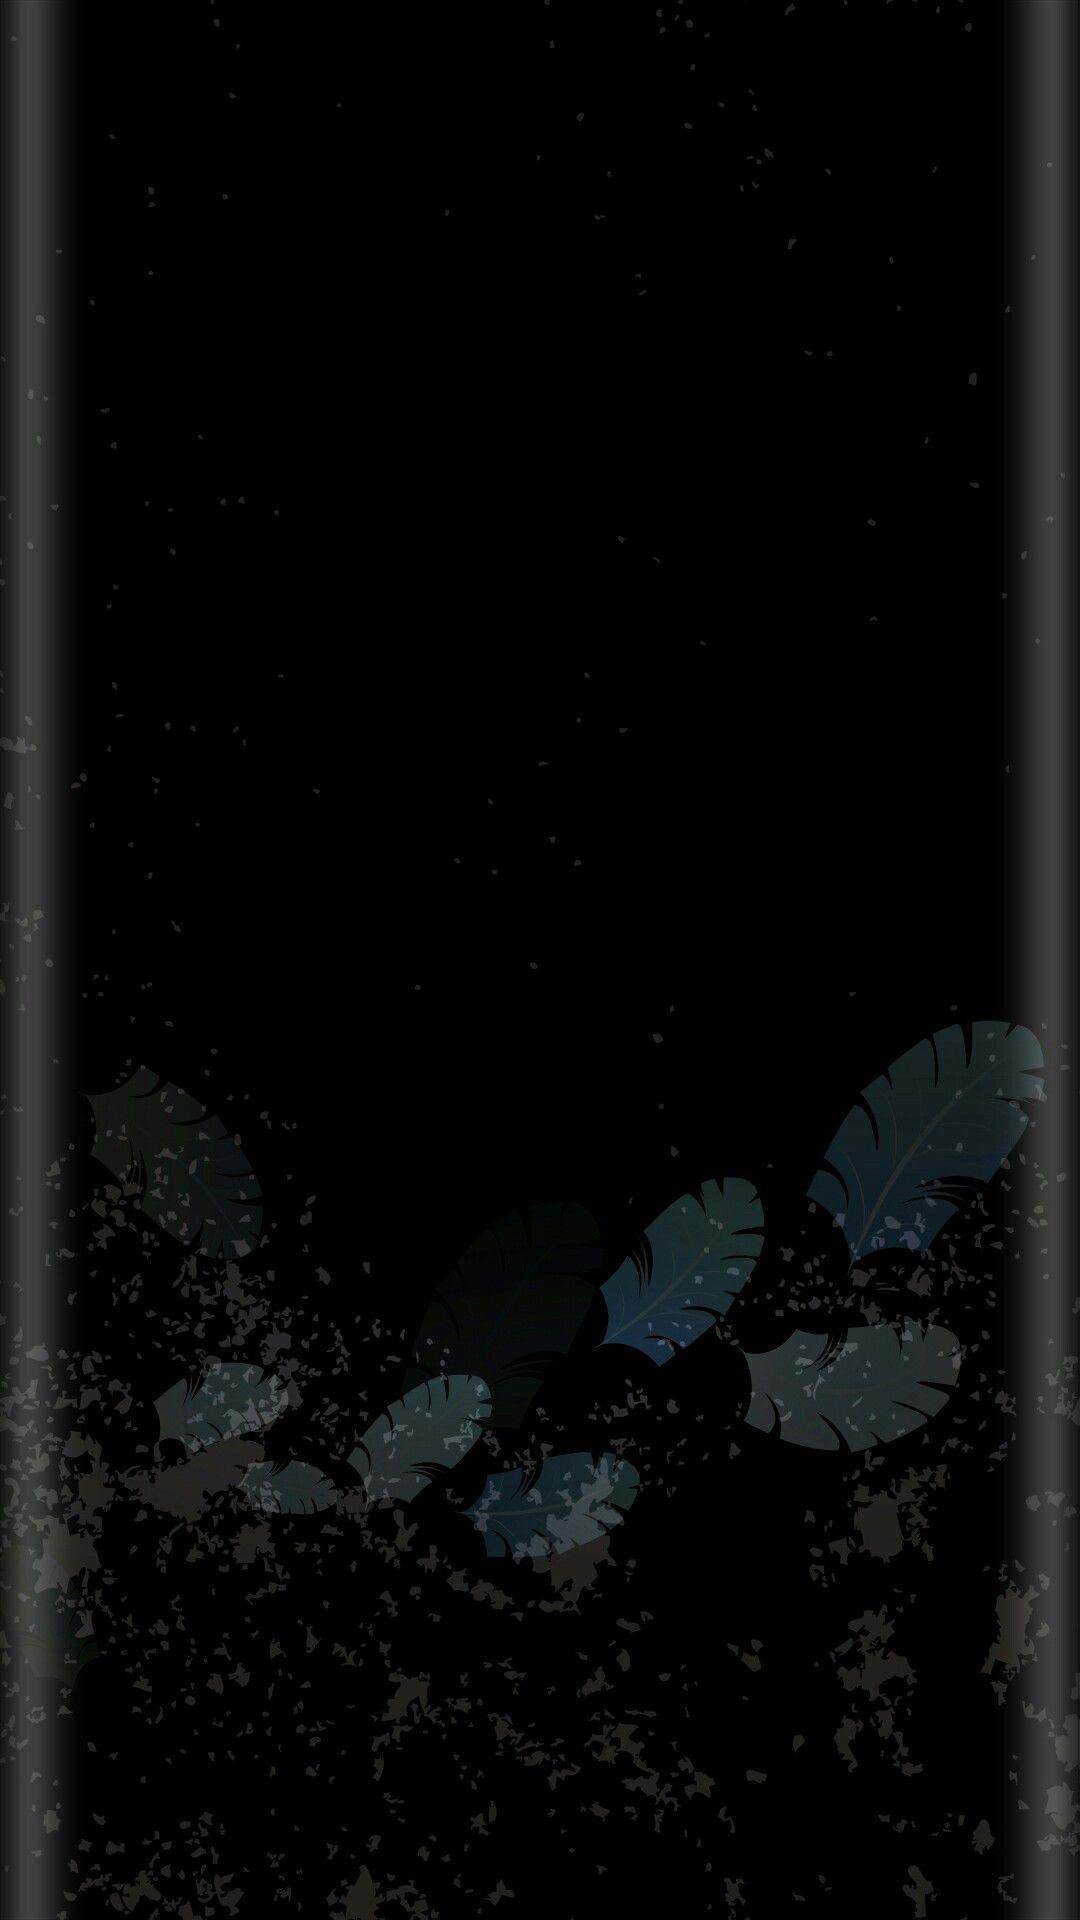 Download Best Black Wallpaper for iPhone 11 2019